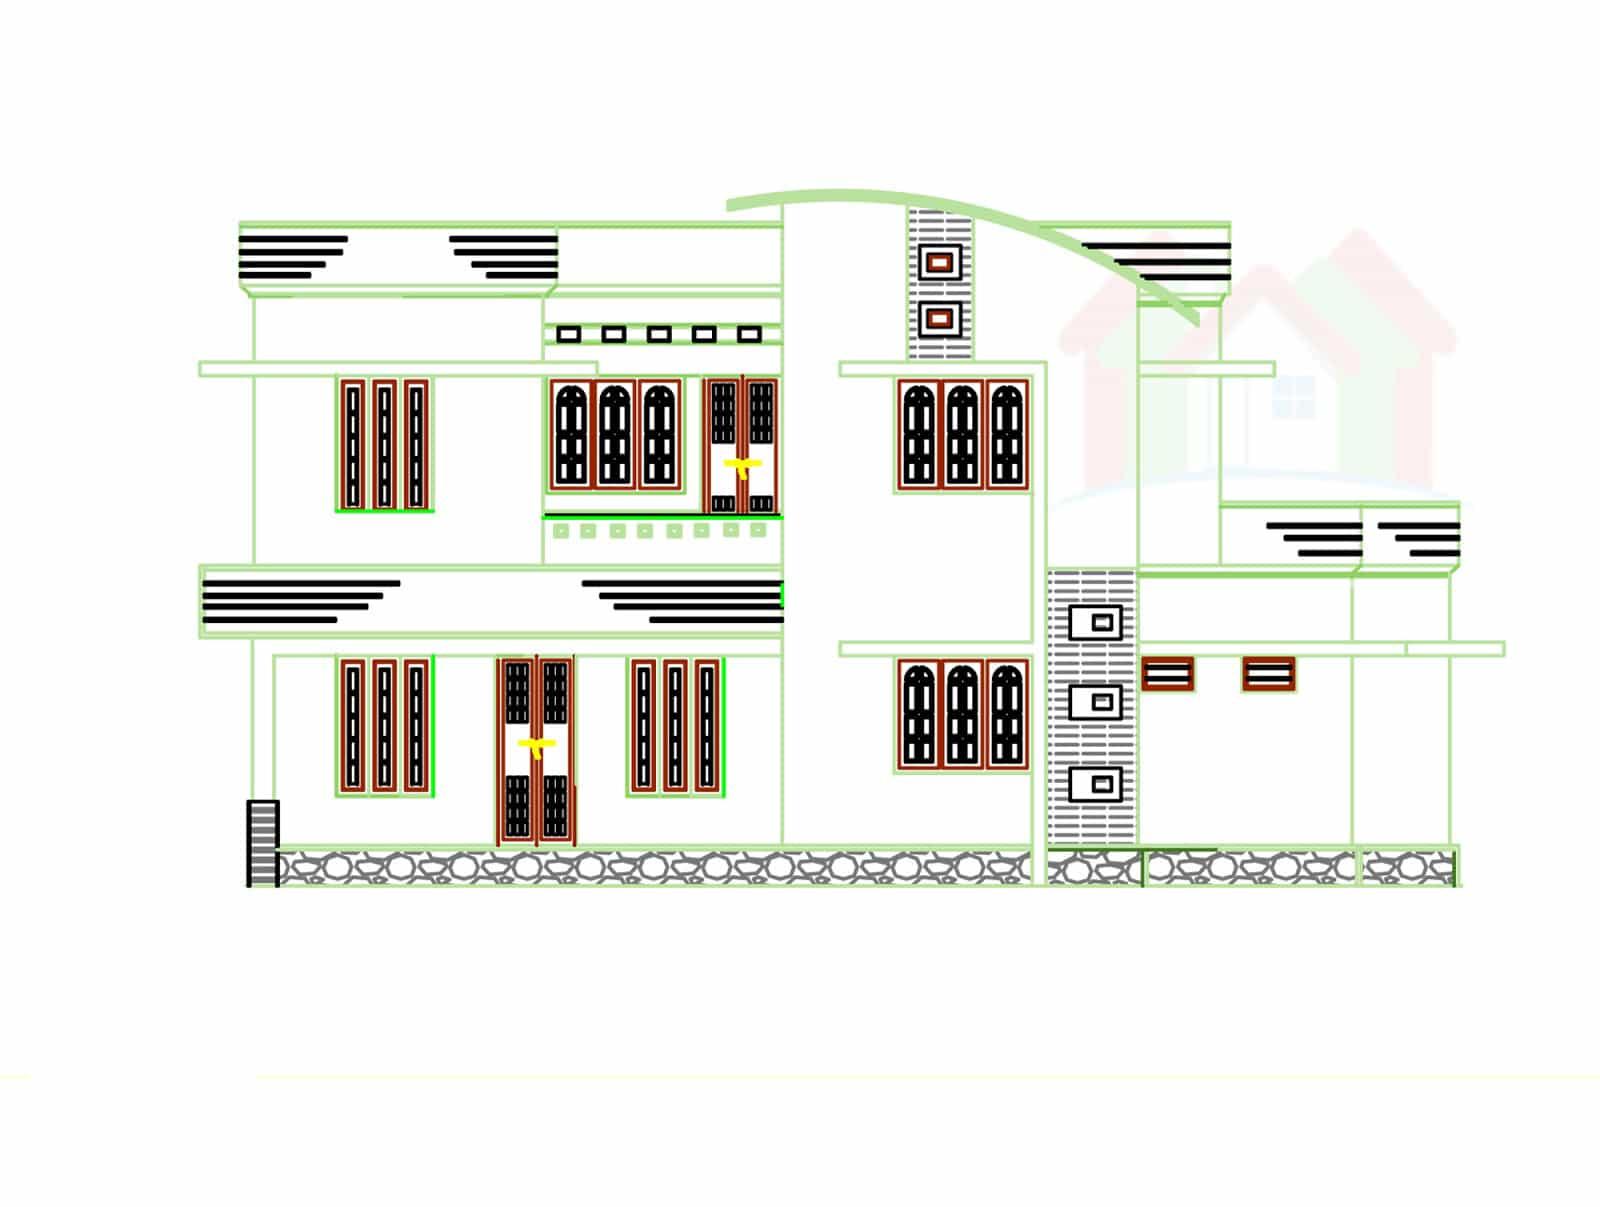 1500 3000 sq ft keralahouseplanner com 2226 house design with kerala - Advertisement Kerala House Plans